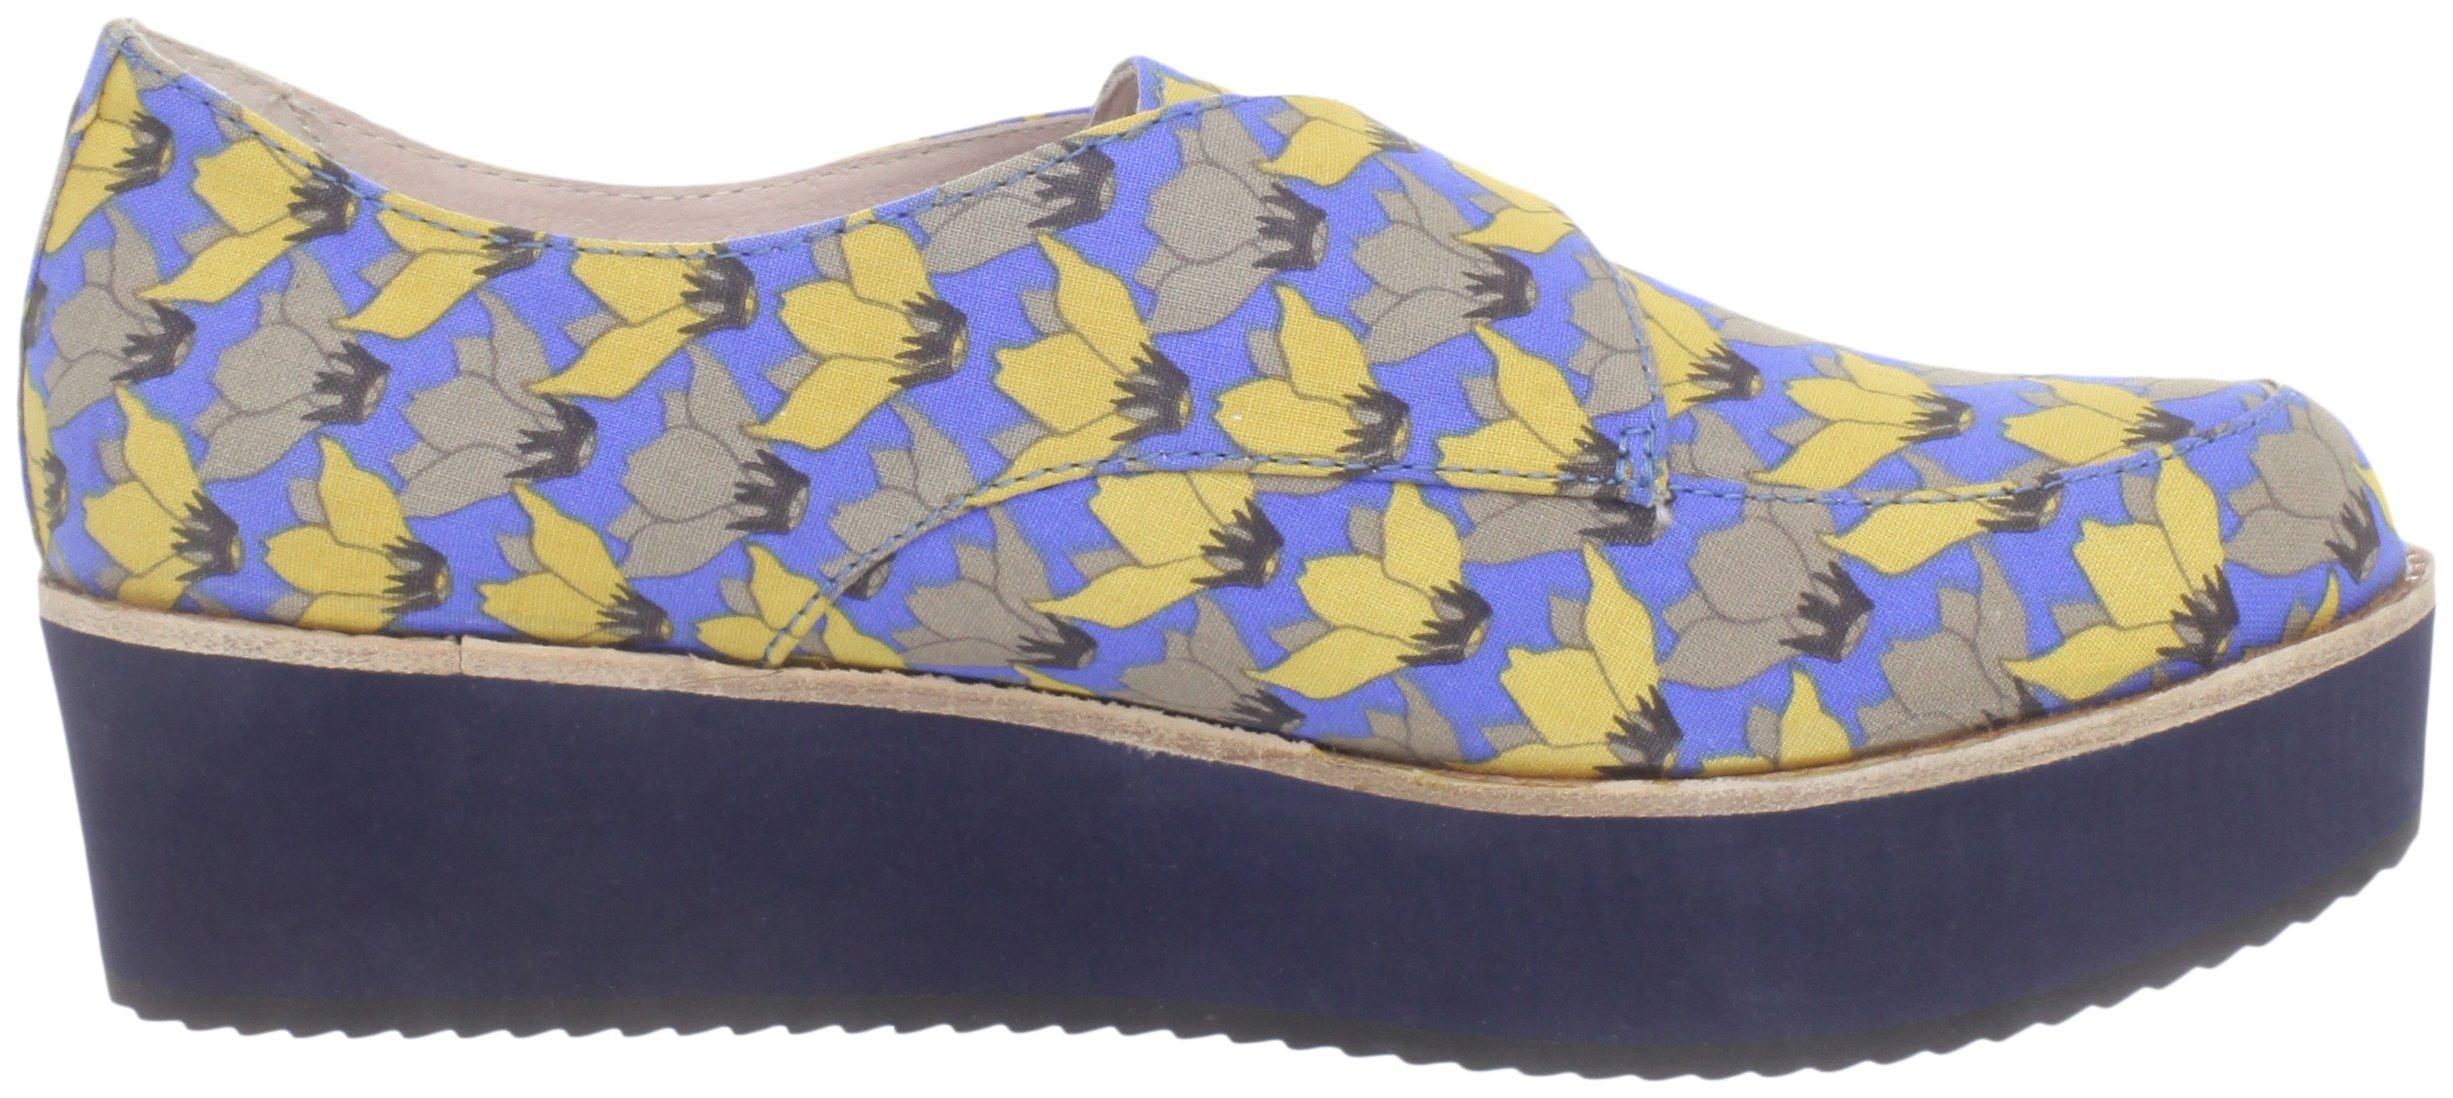 Bass Loves Rachel Antonoff Women's Fleur Loafer, Blue Floral, 6 M US by Bass Loves Rachel Antonoff (Image #6)